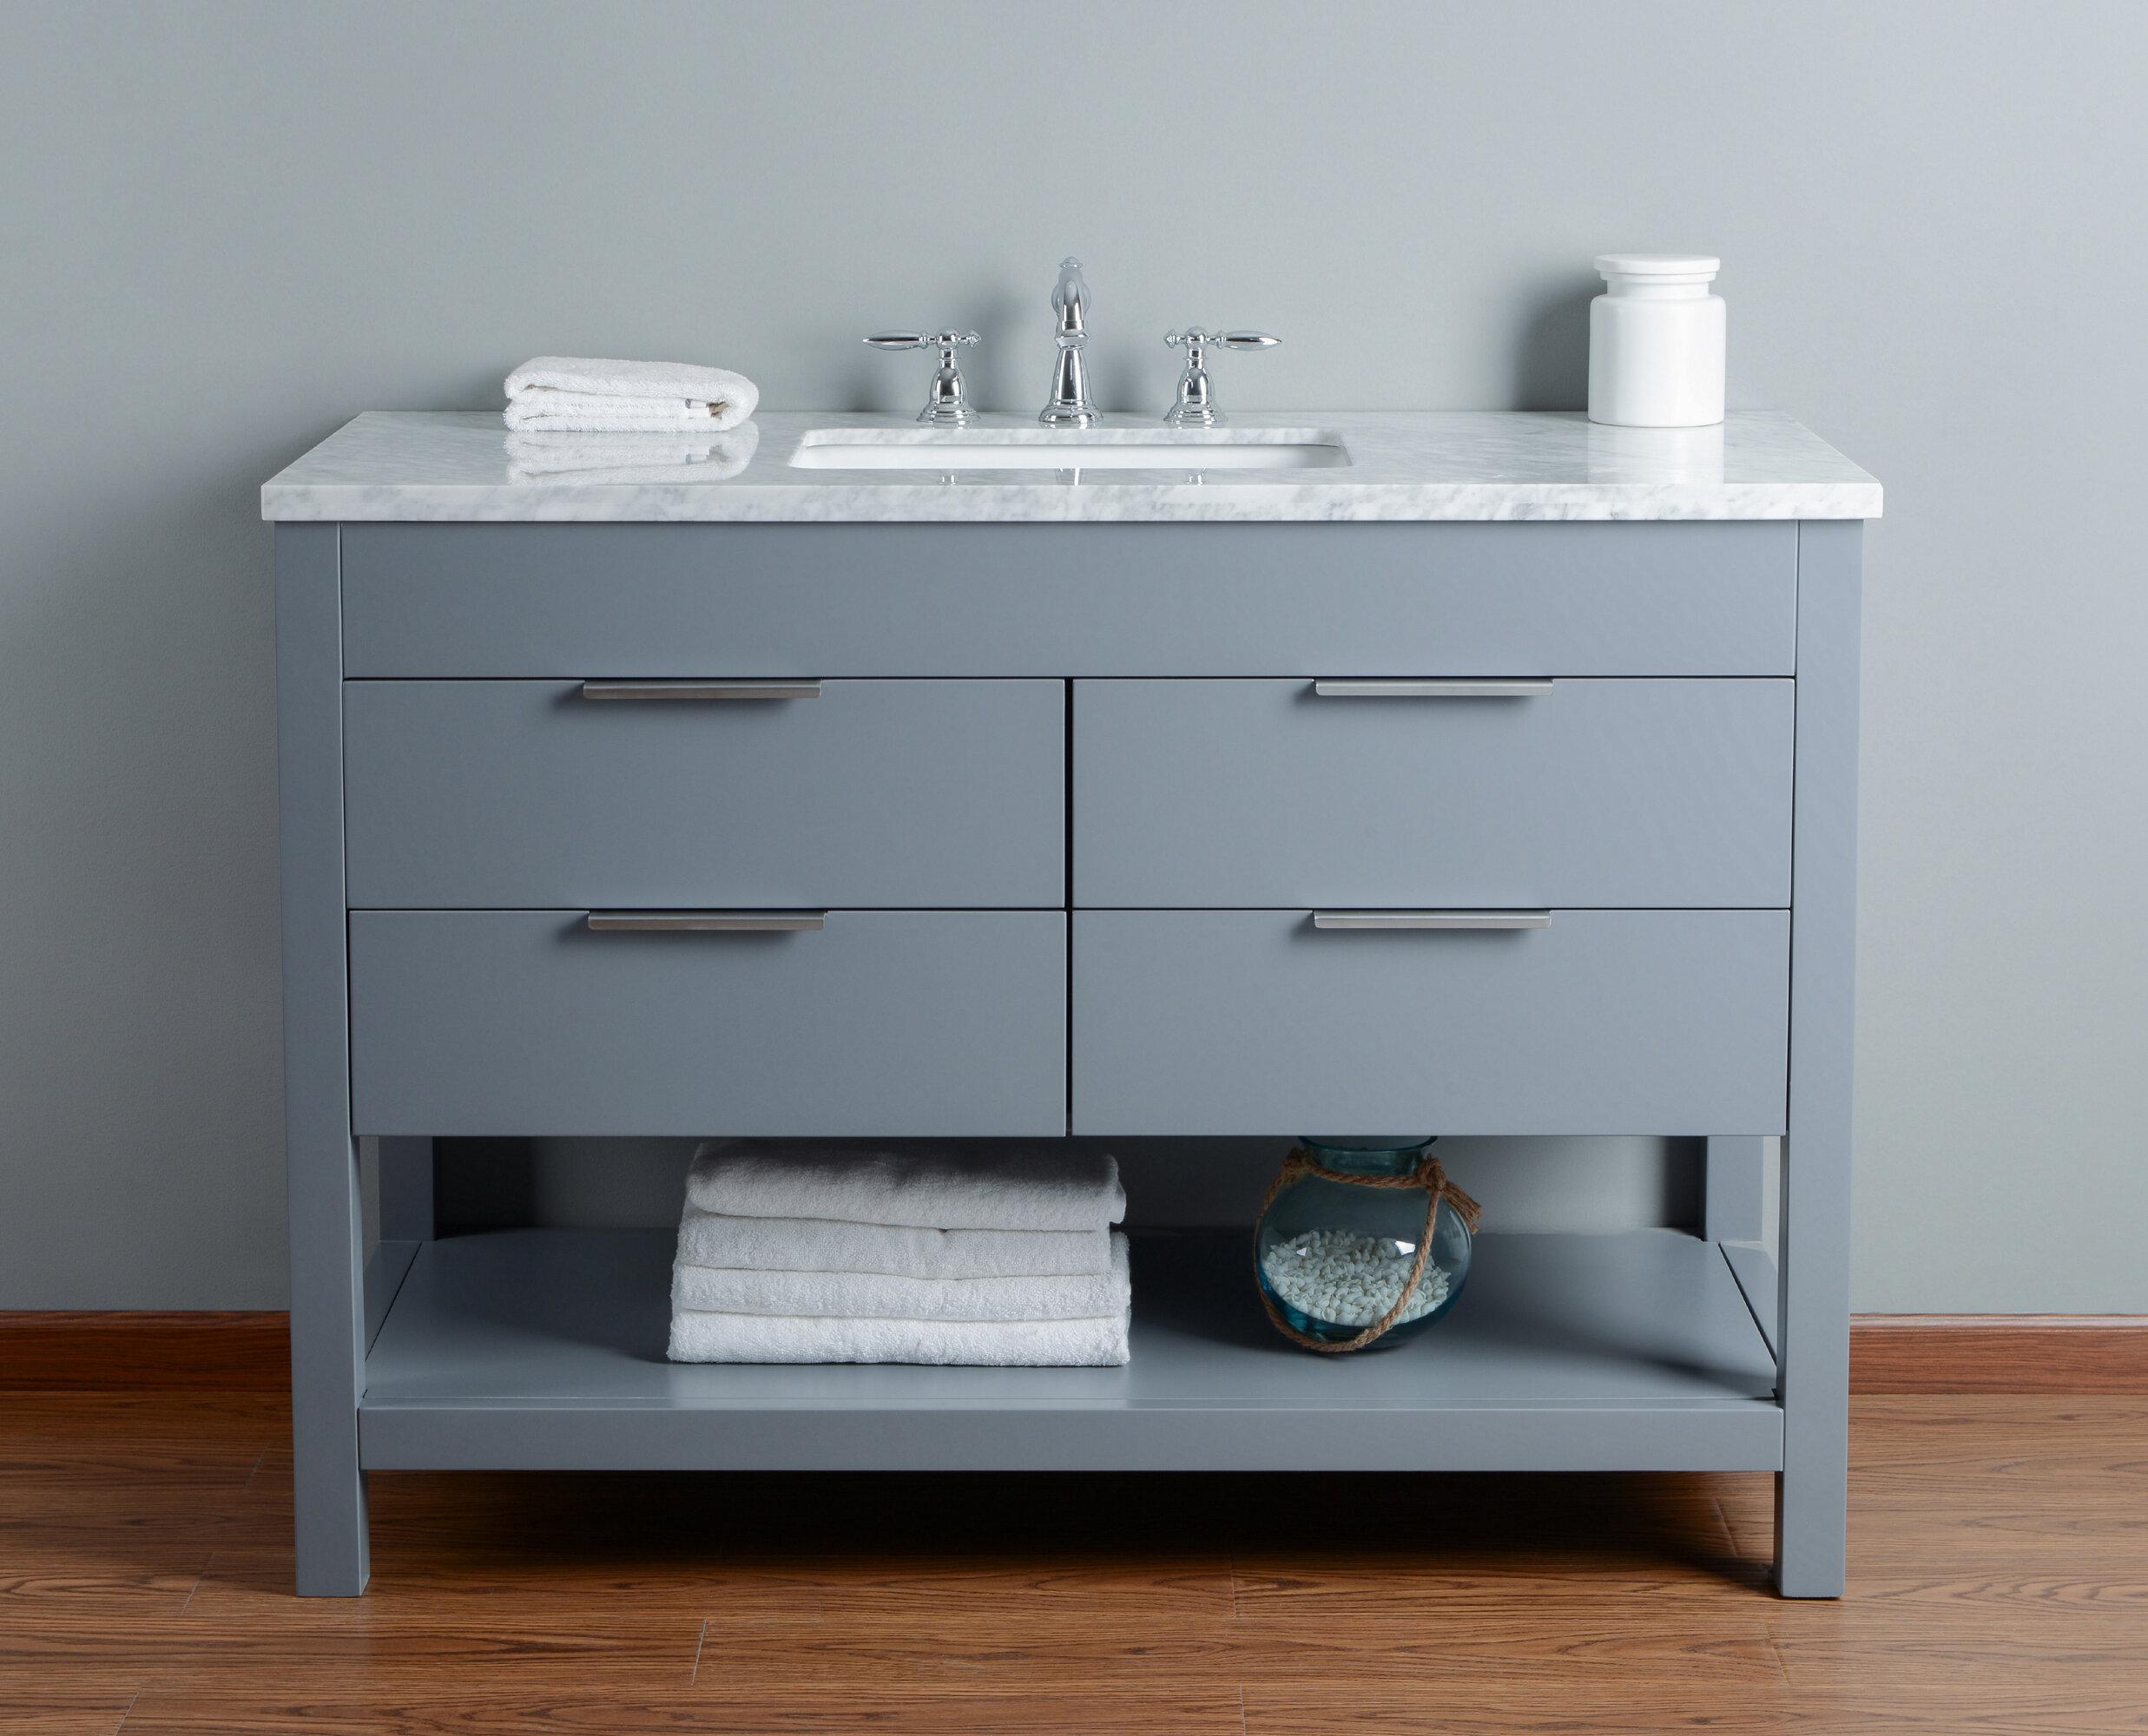 Brayden studio knorr 48 single bathroom vanity set wayfair